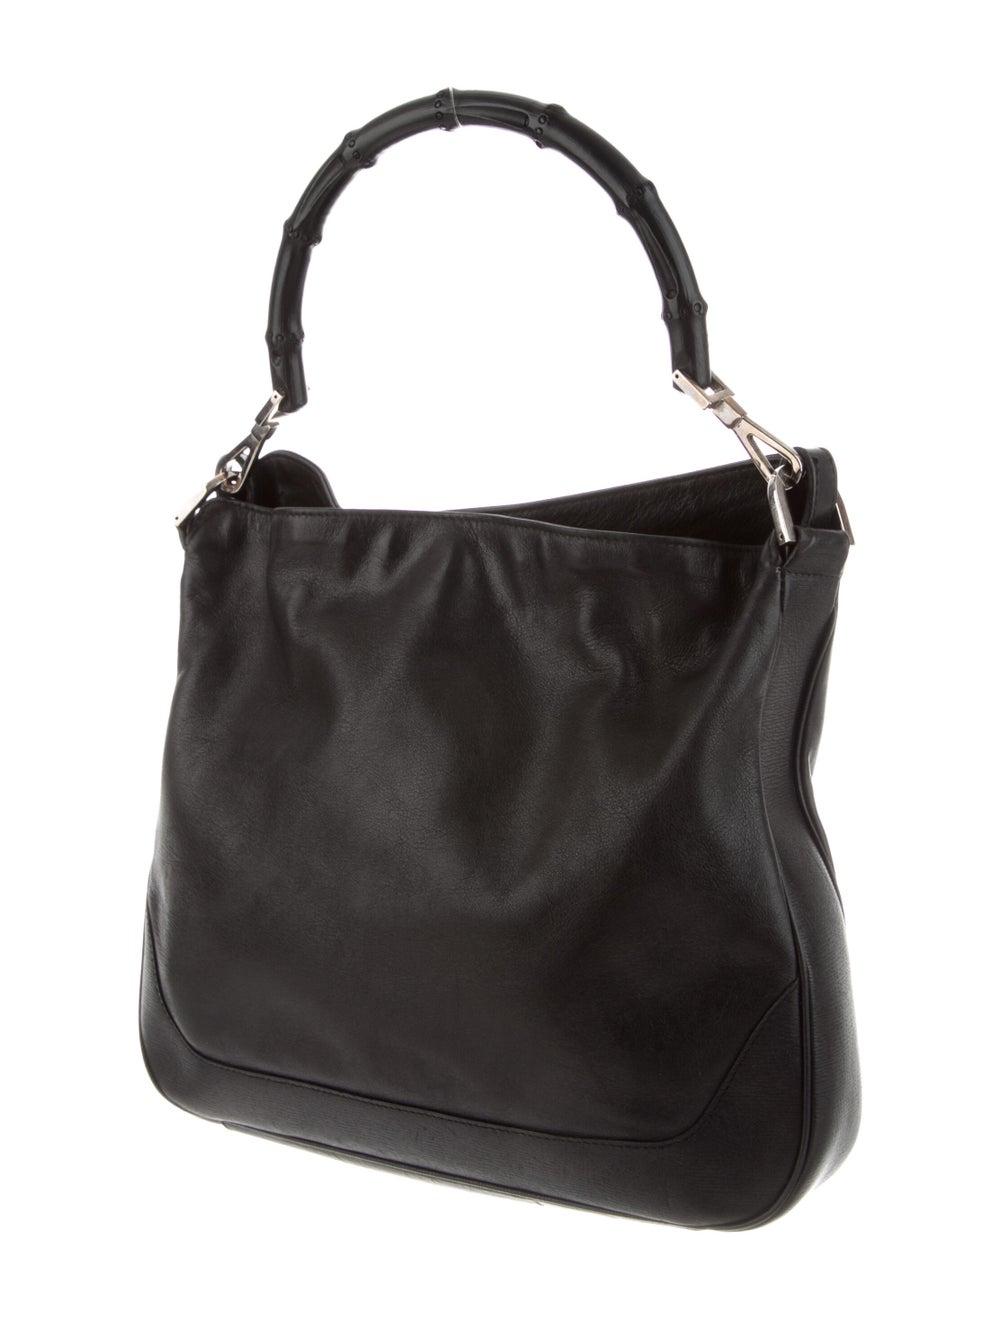 Gucci Vintage Leather Bamboo Handle Bag Black - image 3